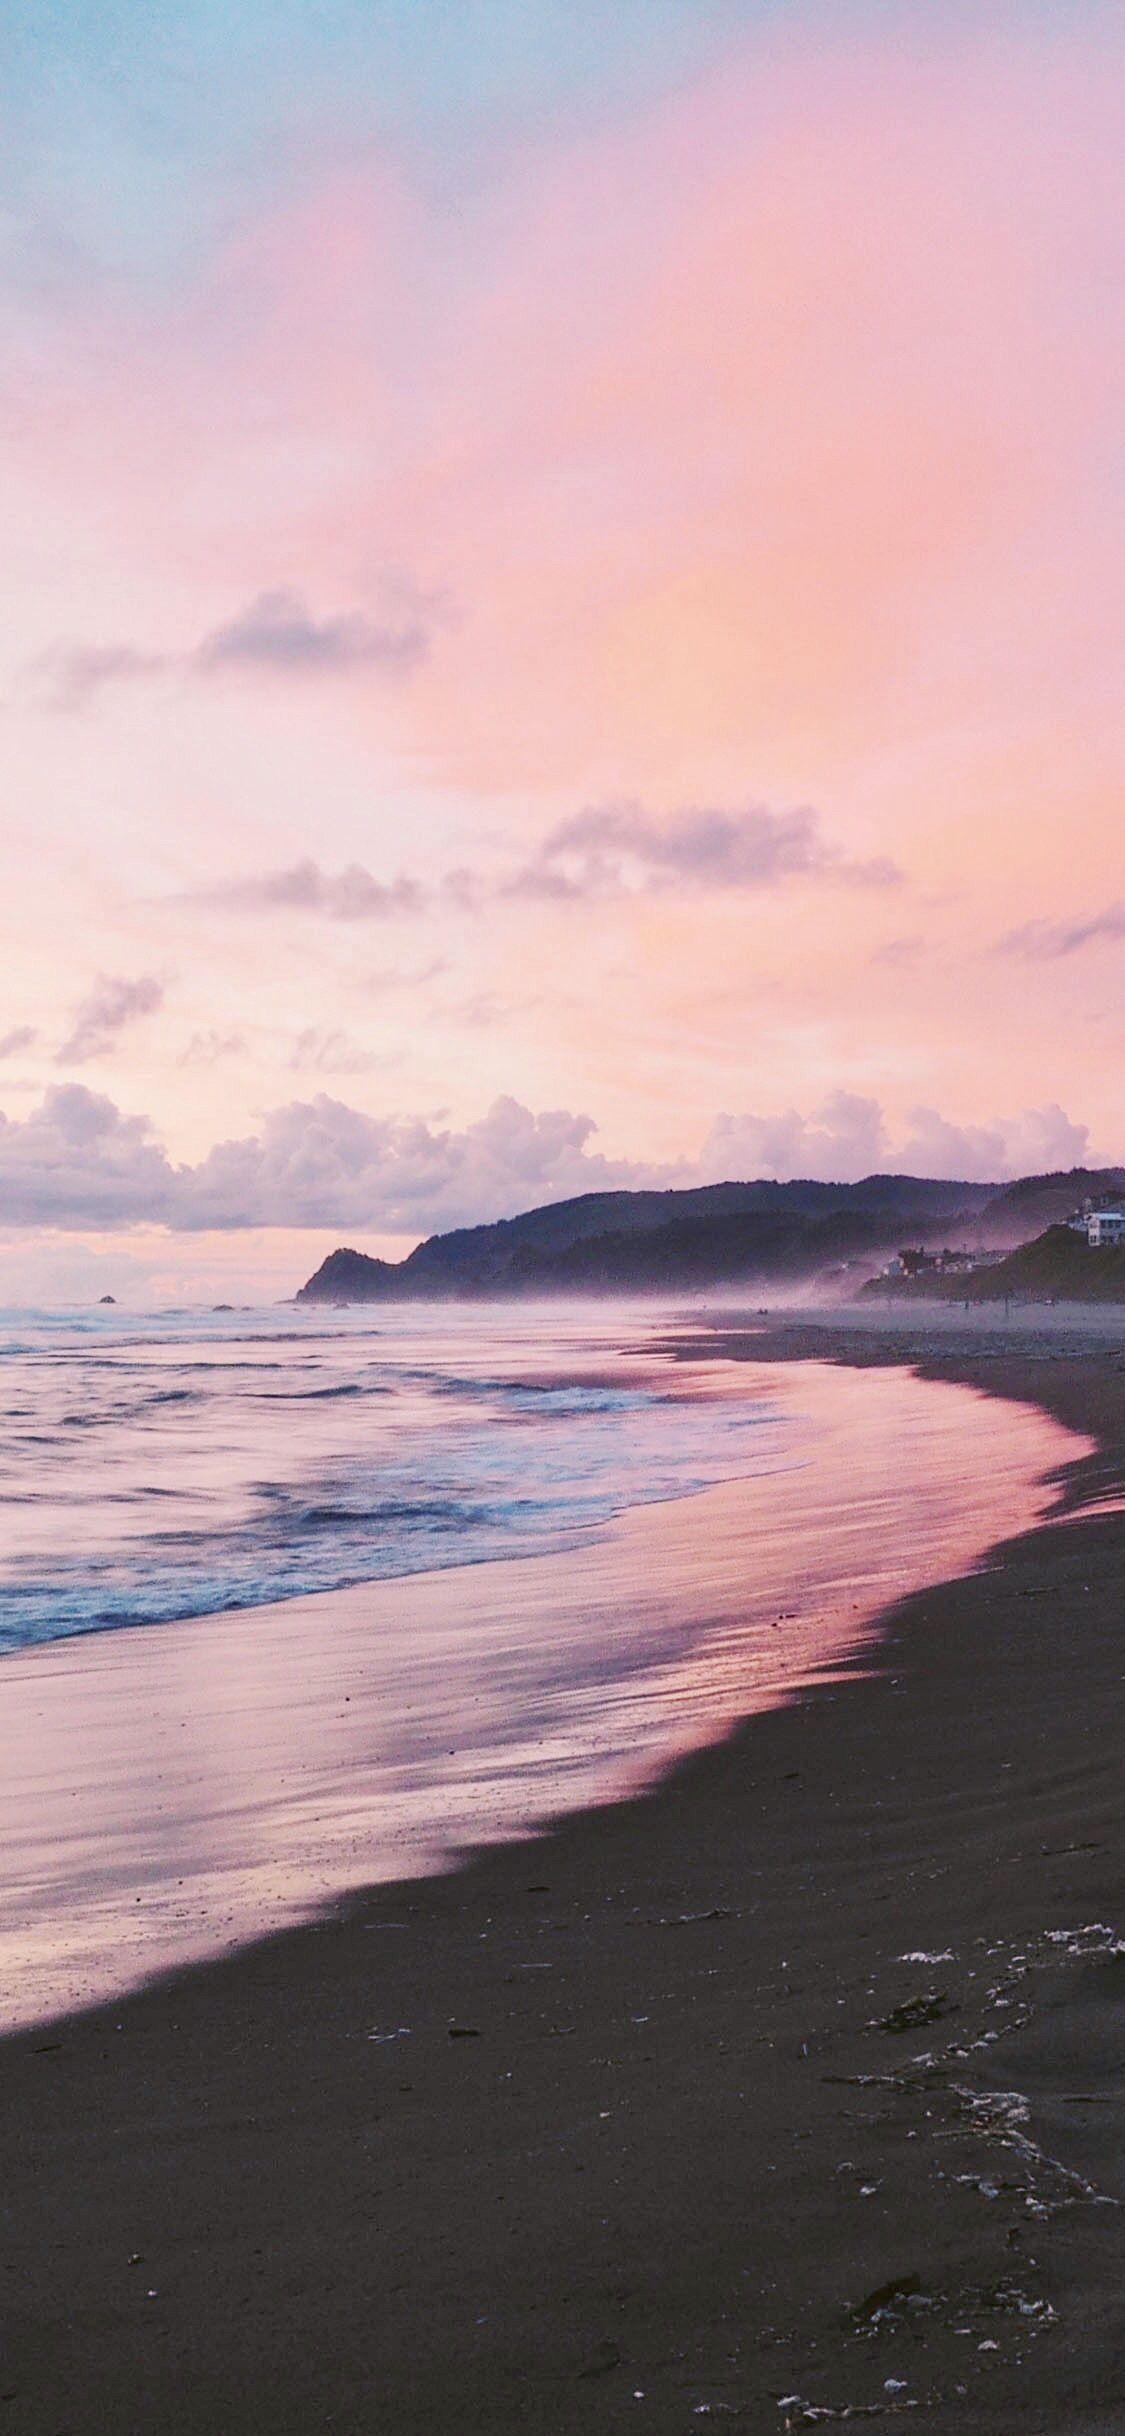 Pink Sunset Iphone Wallpaper Sunset Iphone Wallpaper Beach Wallpaper Iphone Pink Wallpaper Iphone